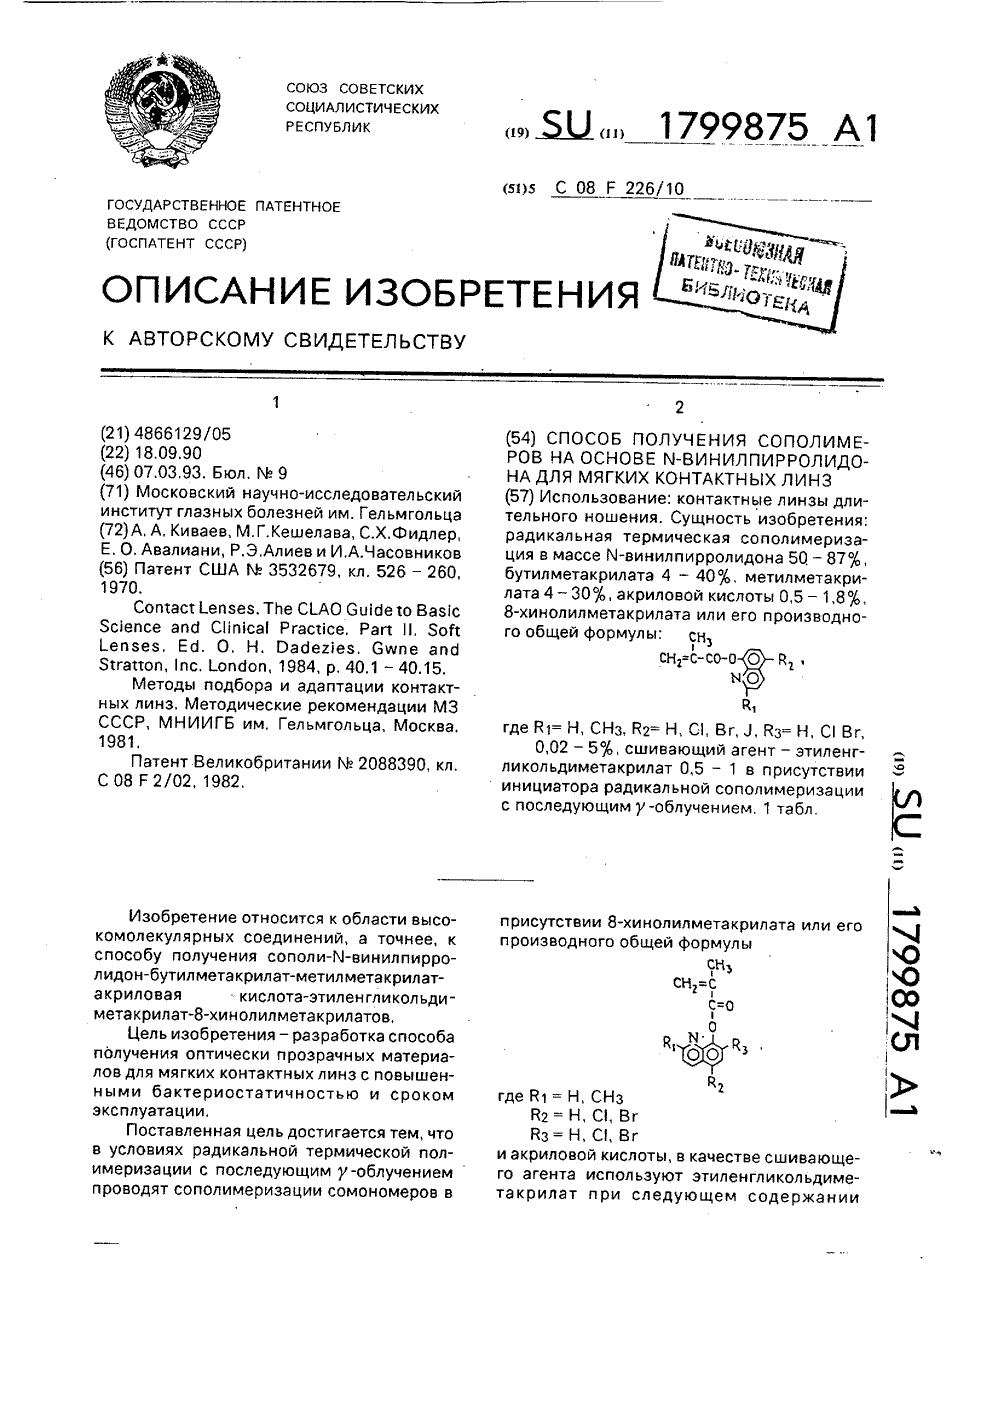 где n=1-20; z=5-60 взаимодействием олигоэфира на основе 3,3-бис-(4-гидроксифенил)фталида и 1,1-дихлор-2,2-ди